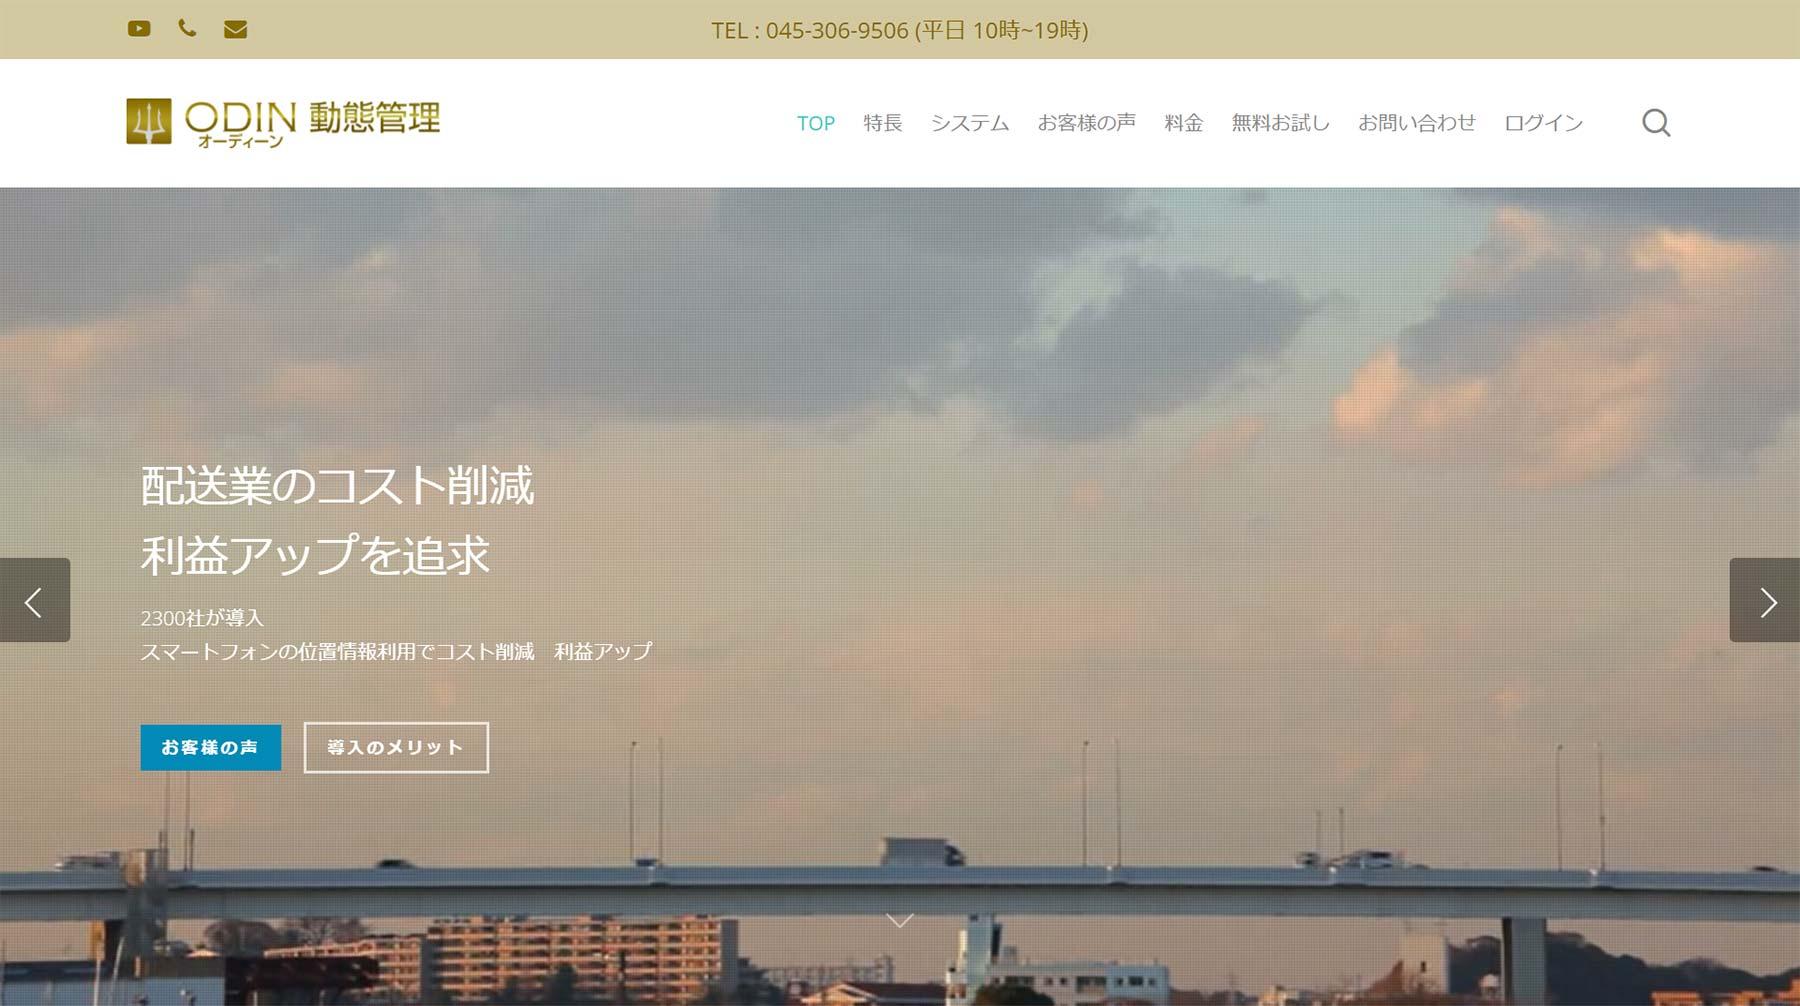 ODIN動態管理公式Webサイト